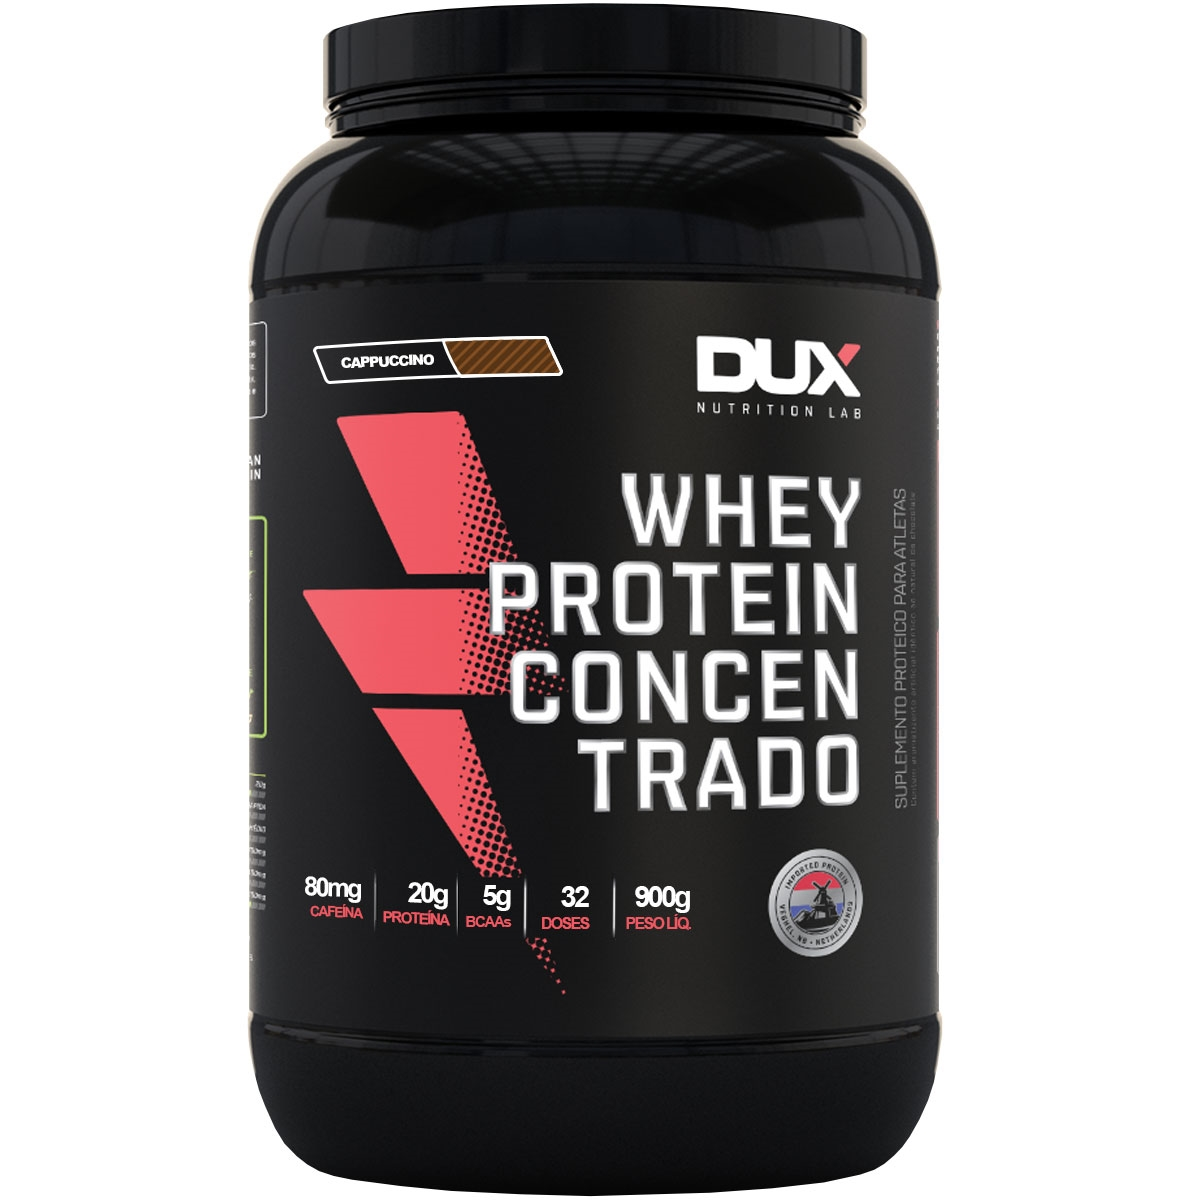 Whey Protein Concentrado Cappuccino - Pote 900g